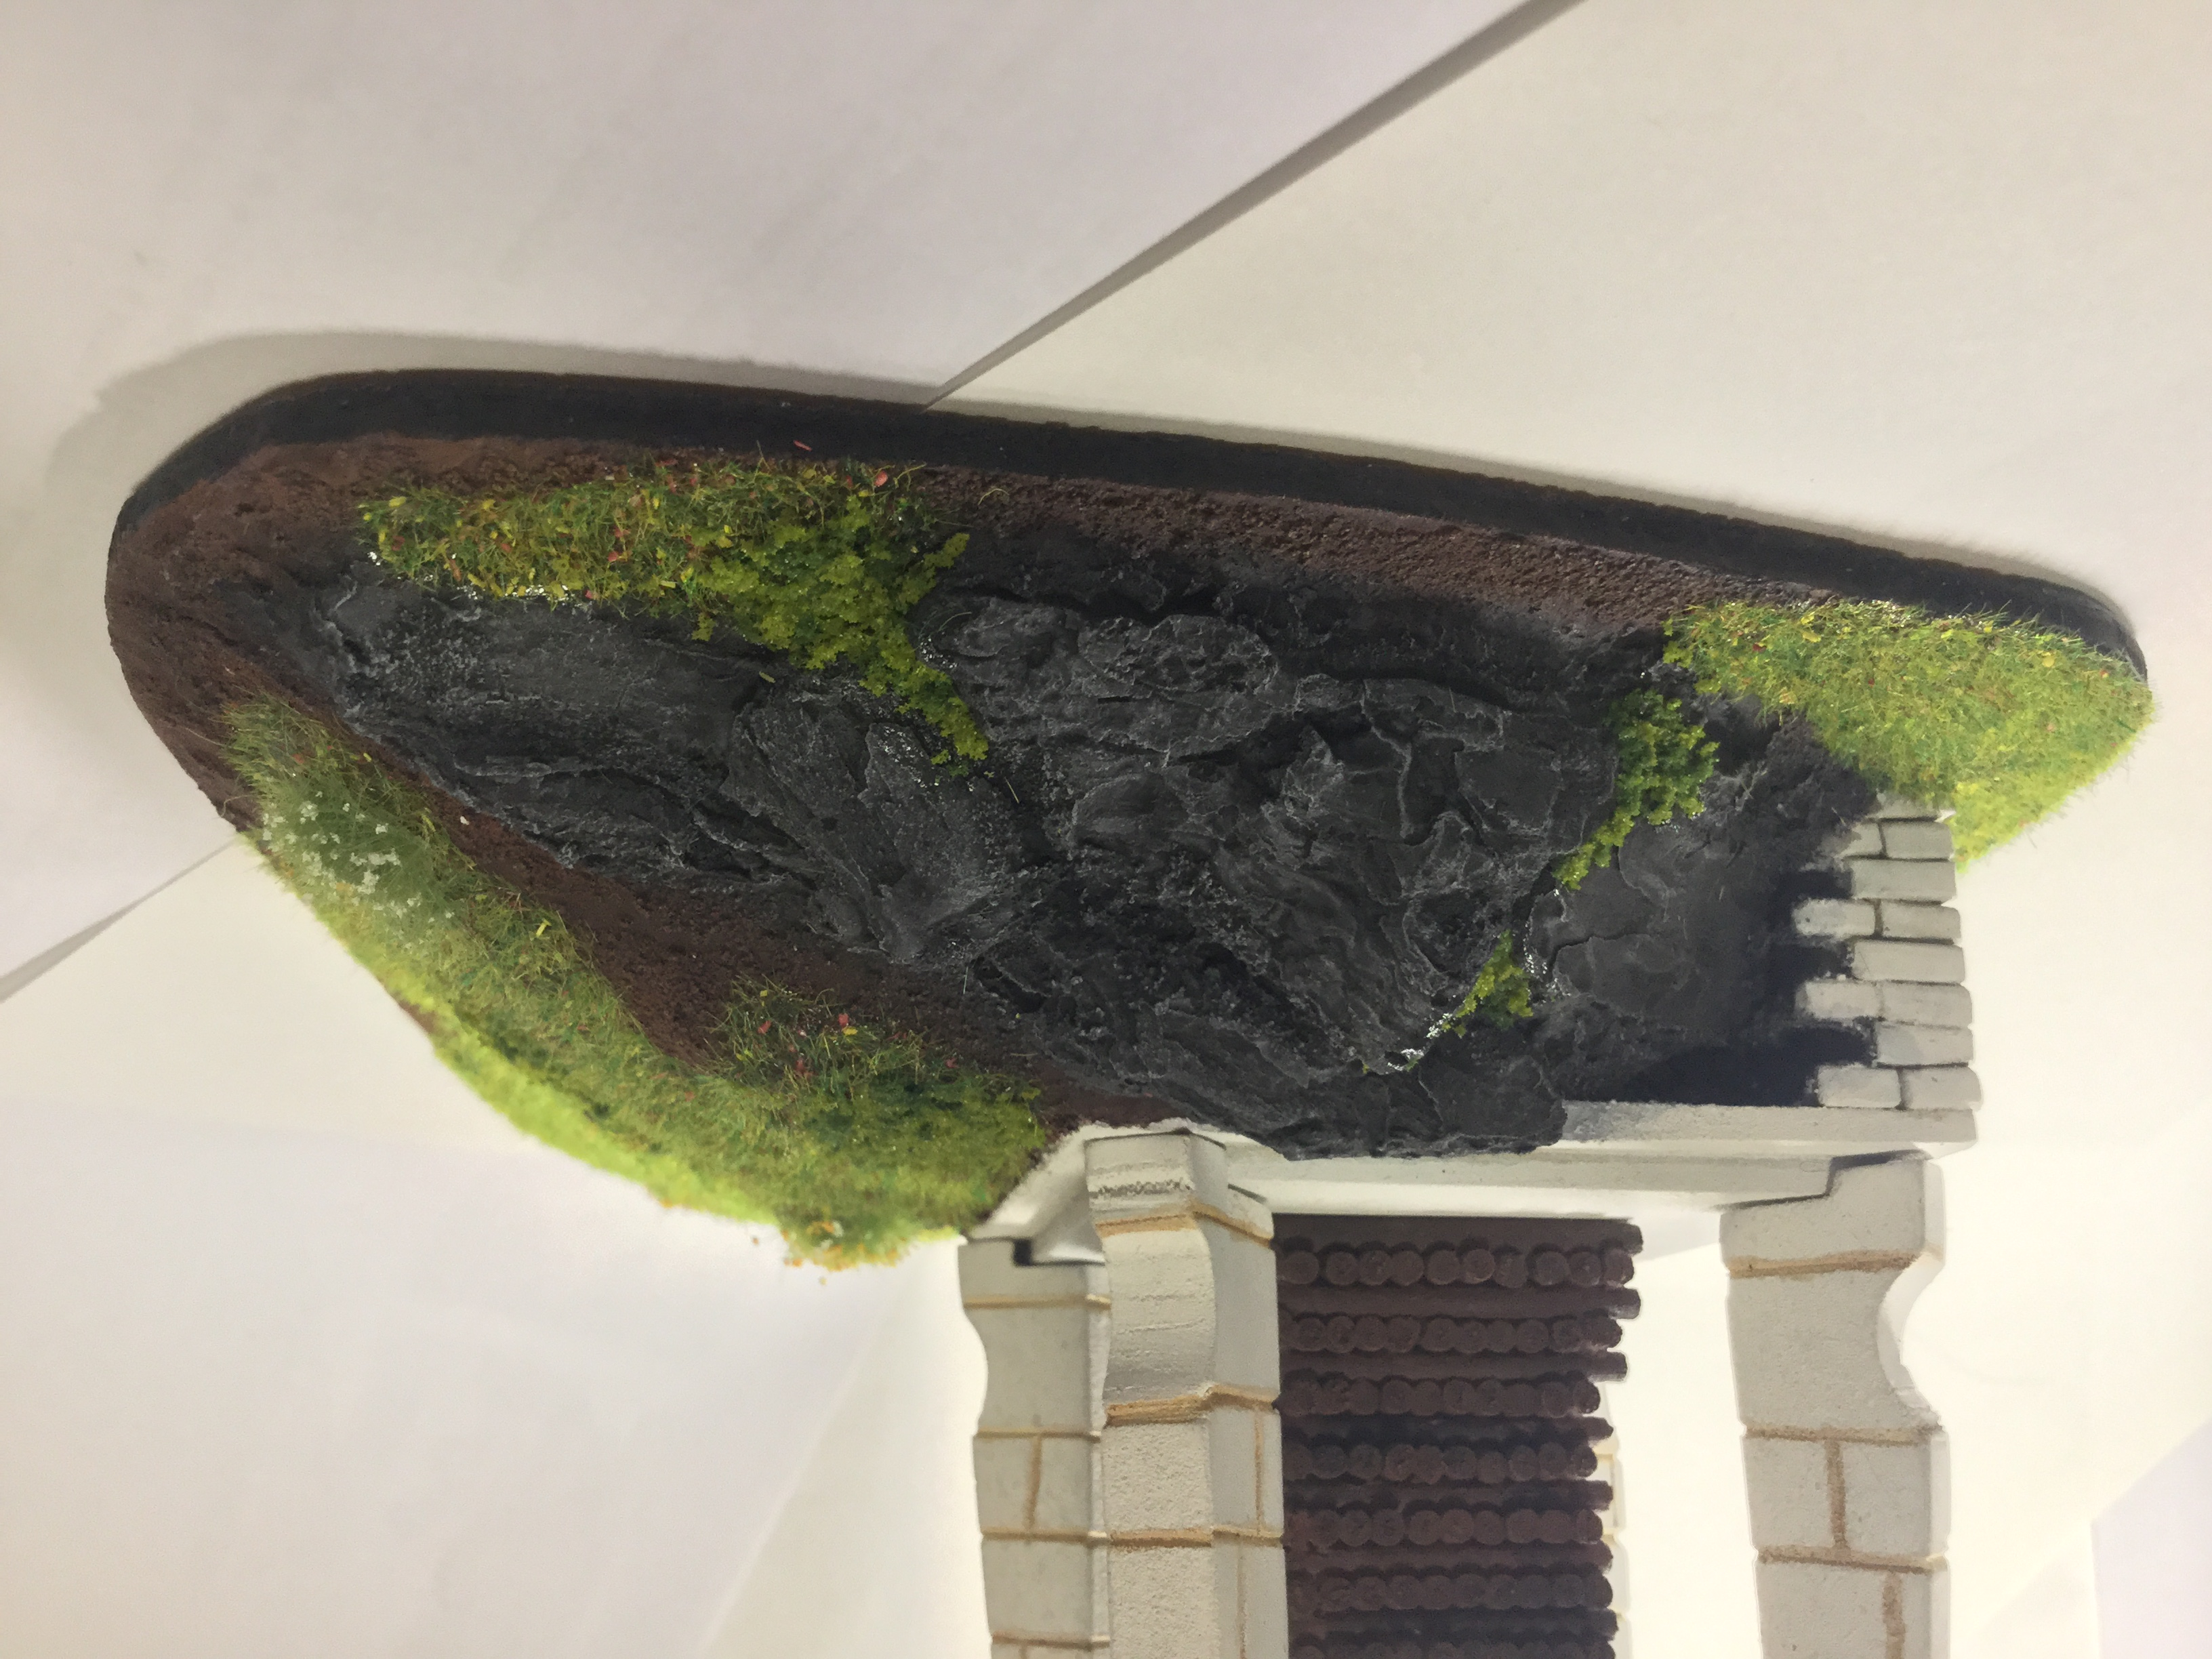 Colline et feu d'alarme du Gondor 1571001645-feu-d-alarme-du-gondor-aout-2019-1